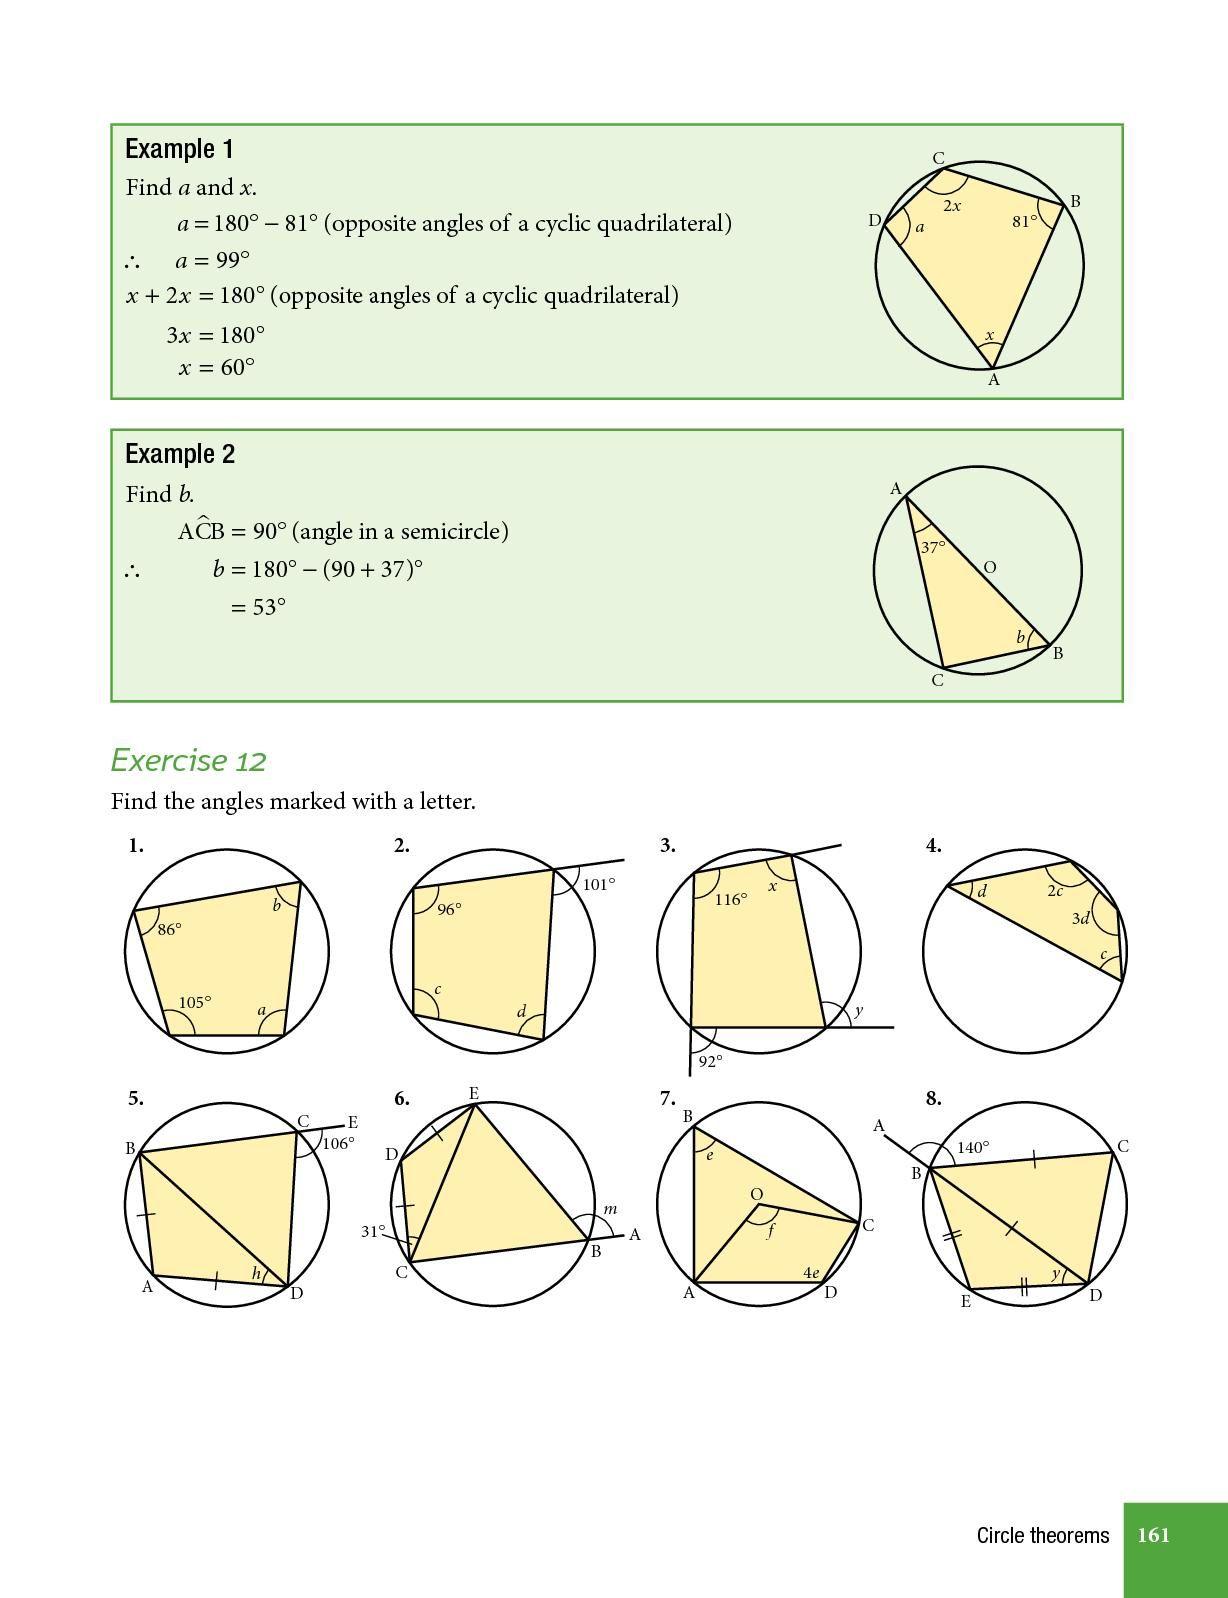 Pdf Print Complete Mathematics For Cambridge Igcse Fifth Edition Extended Cambridge Igcse Mathematics Cambridge [ 1598 x 1228 Pixel ]